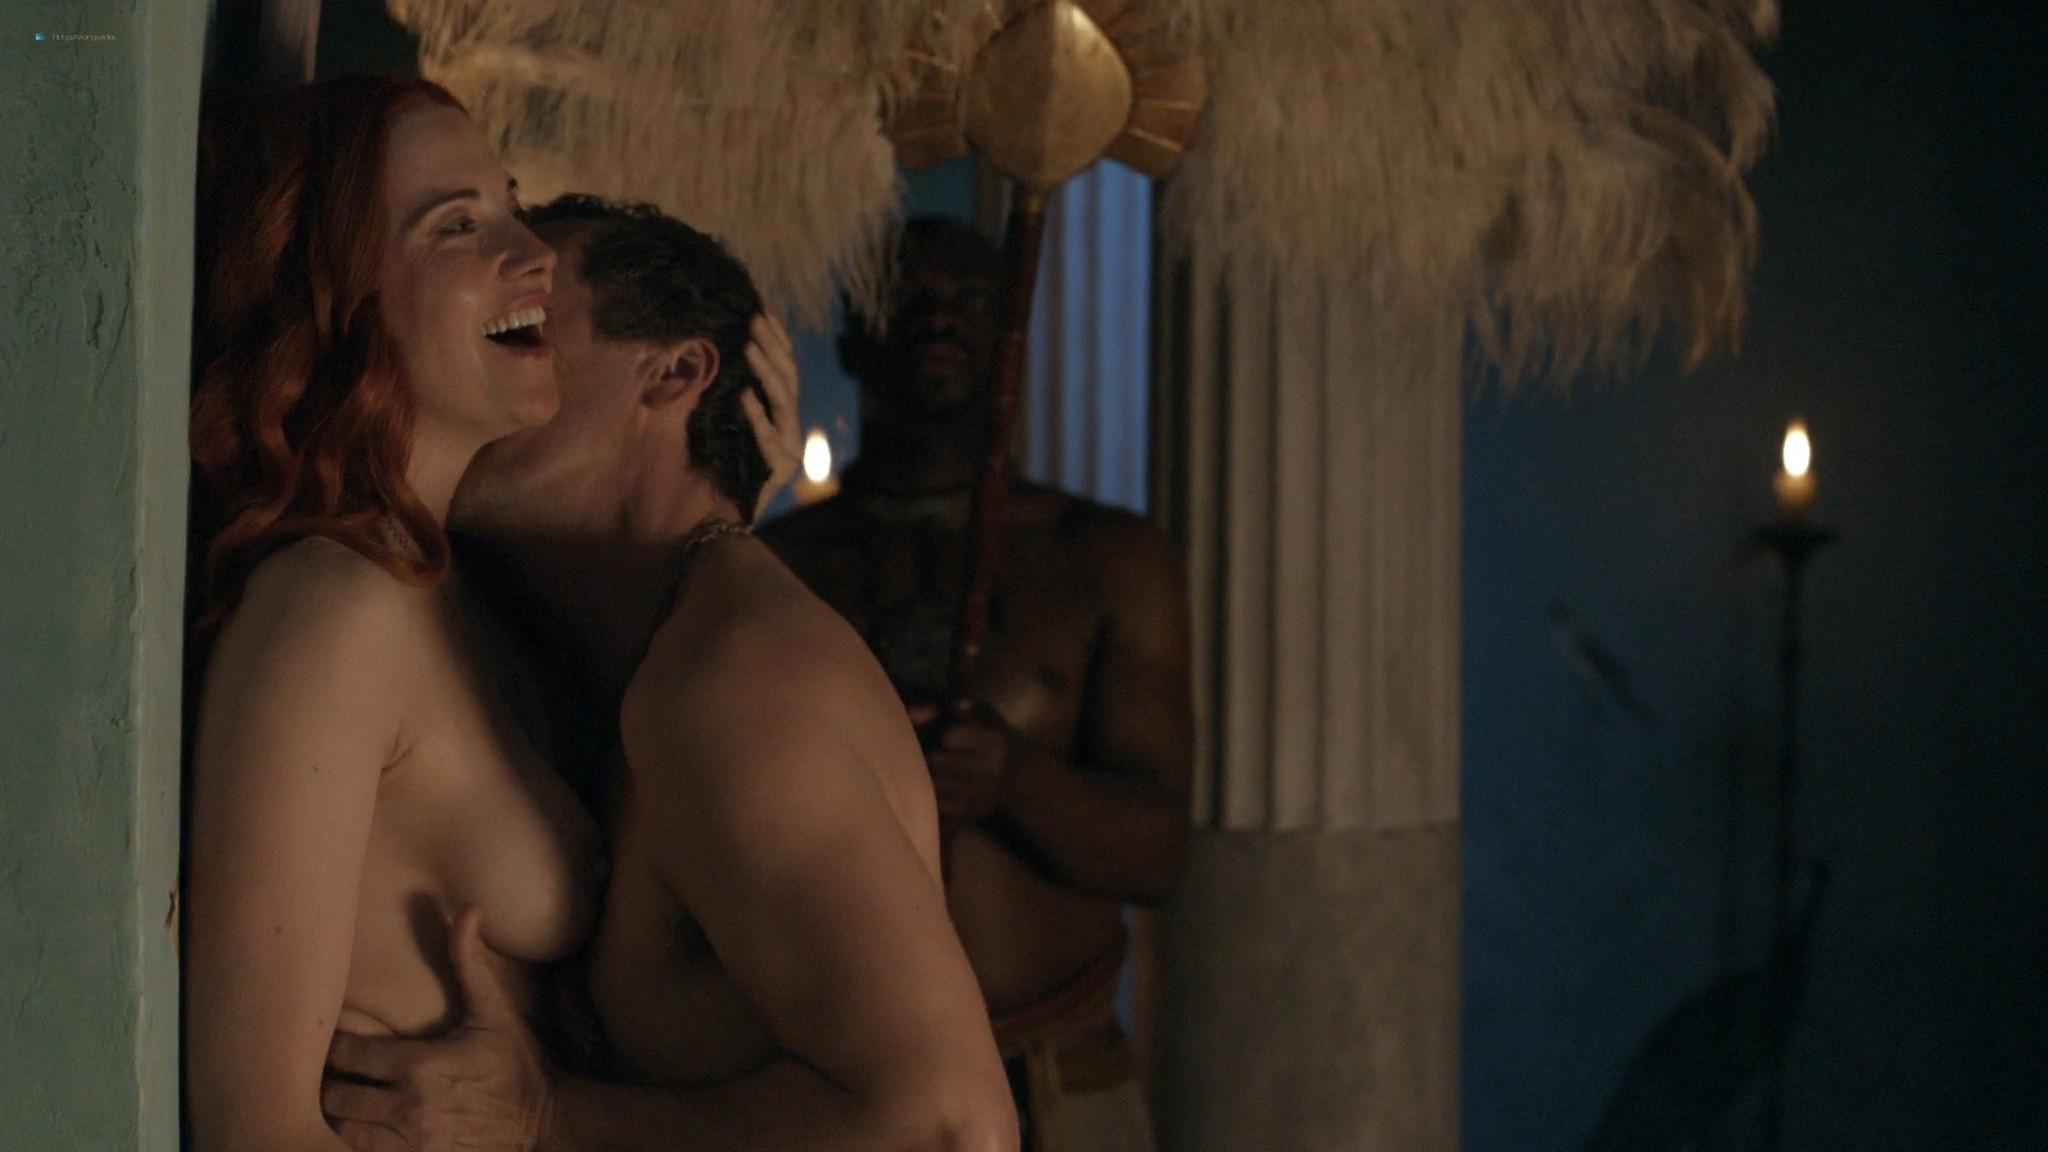 Lucy Lawless nude sex Erin Cummings, Aria Dickson nude too - Spartacus - Sacramentum Gladiatorum (2010) s1e2 HD 1080p (4)